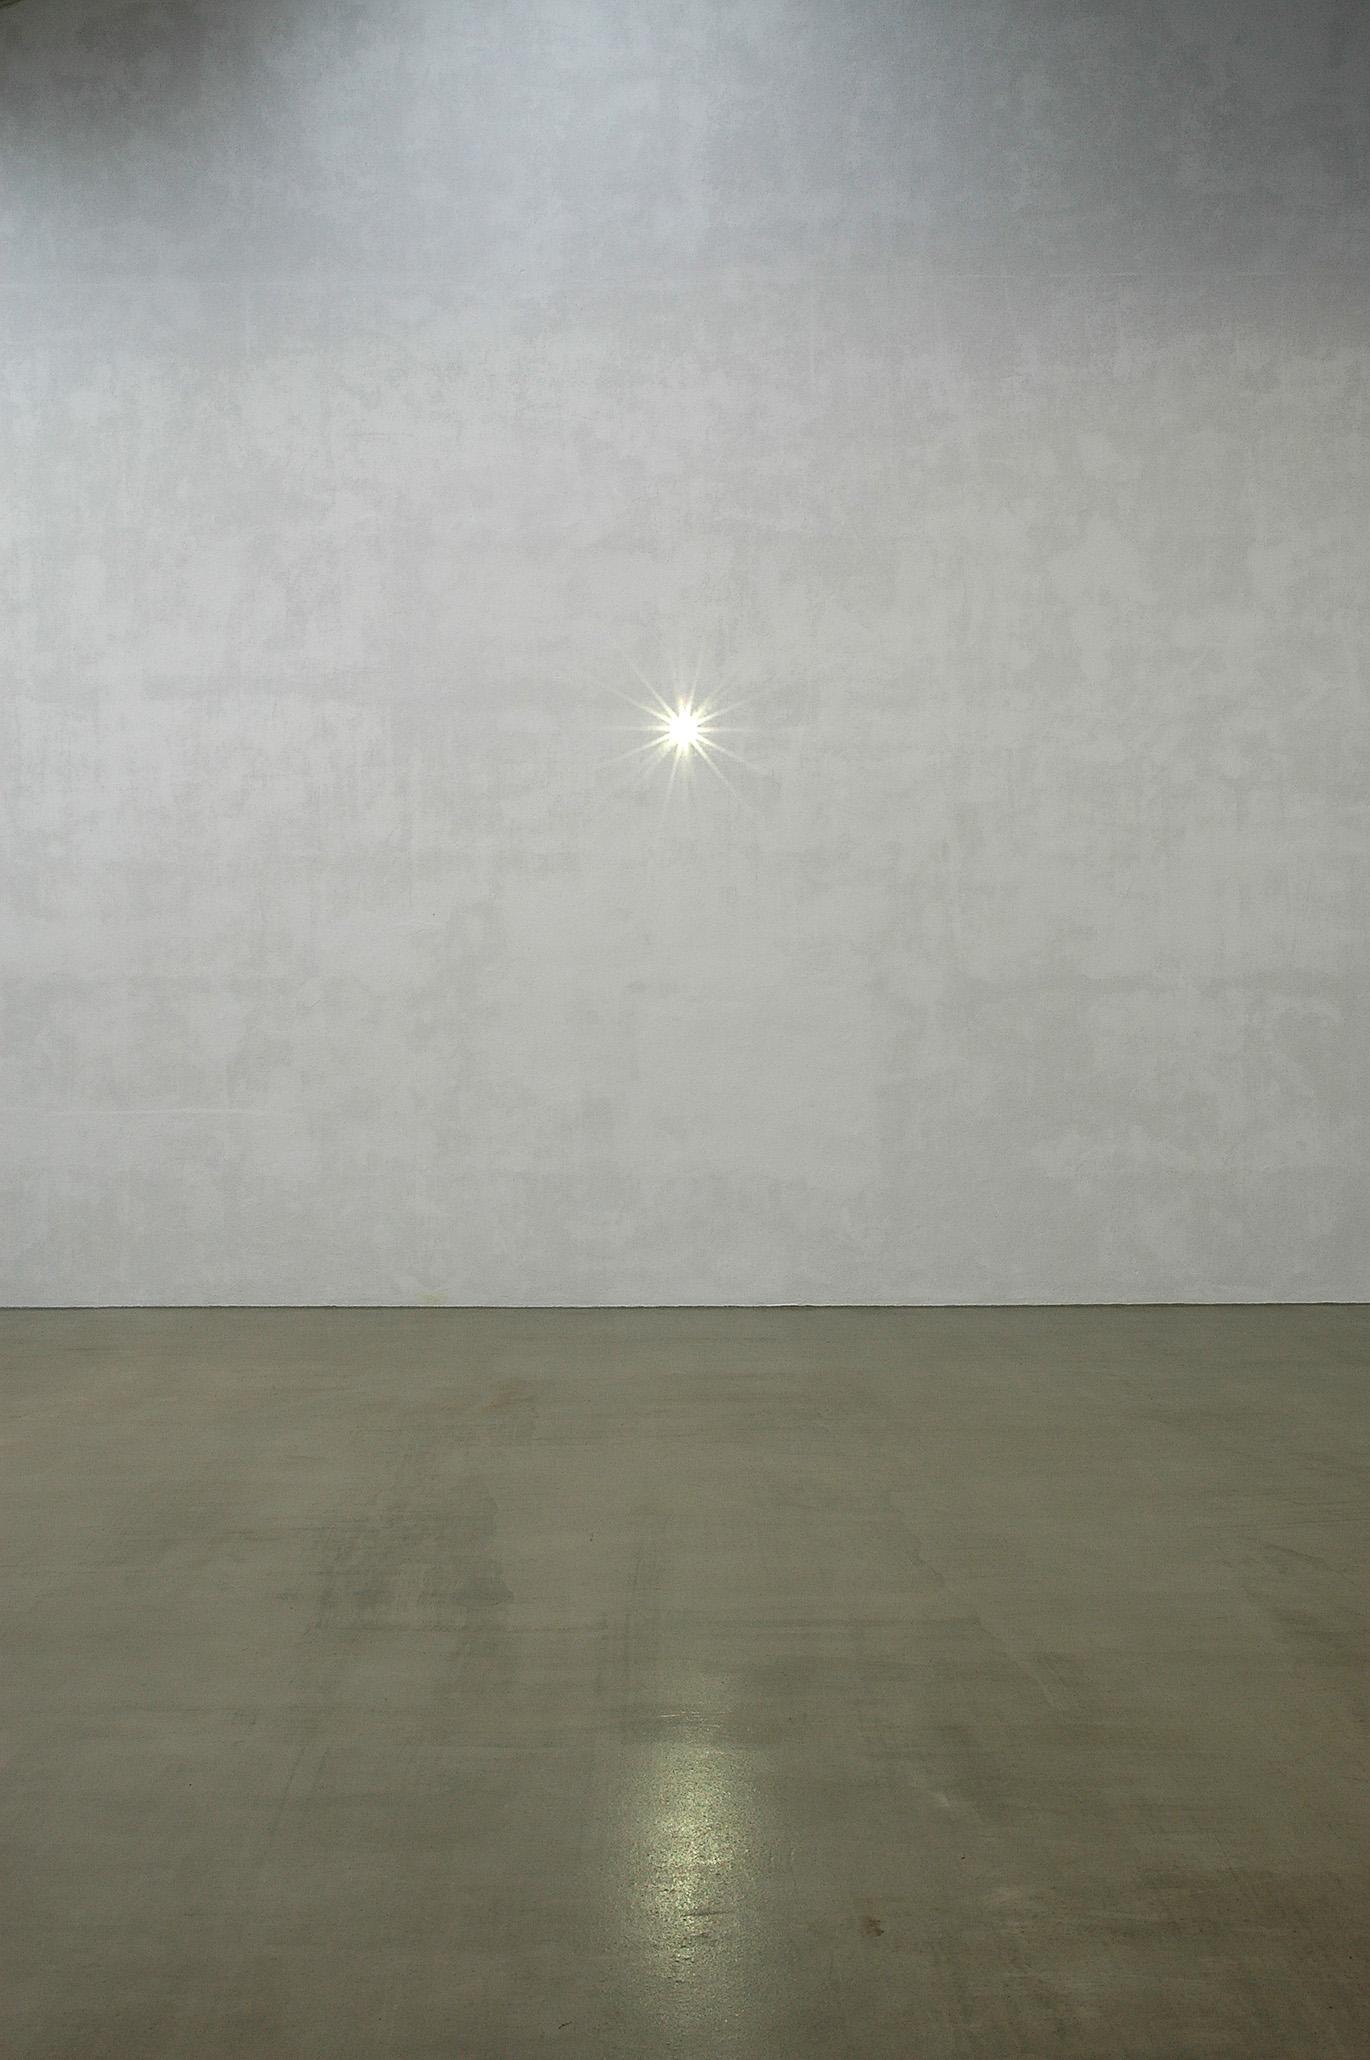 Carsten Nicolai, Inver, 2005. Courtesy: Galerie EIGEN + ART Leipzig/Berlin e The Pace Gallery. Photo: Uwe Walter, Berlin.